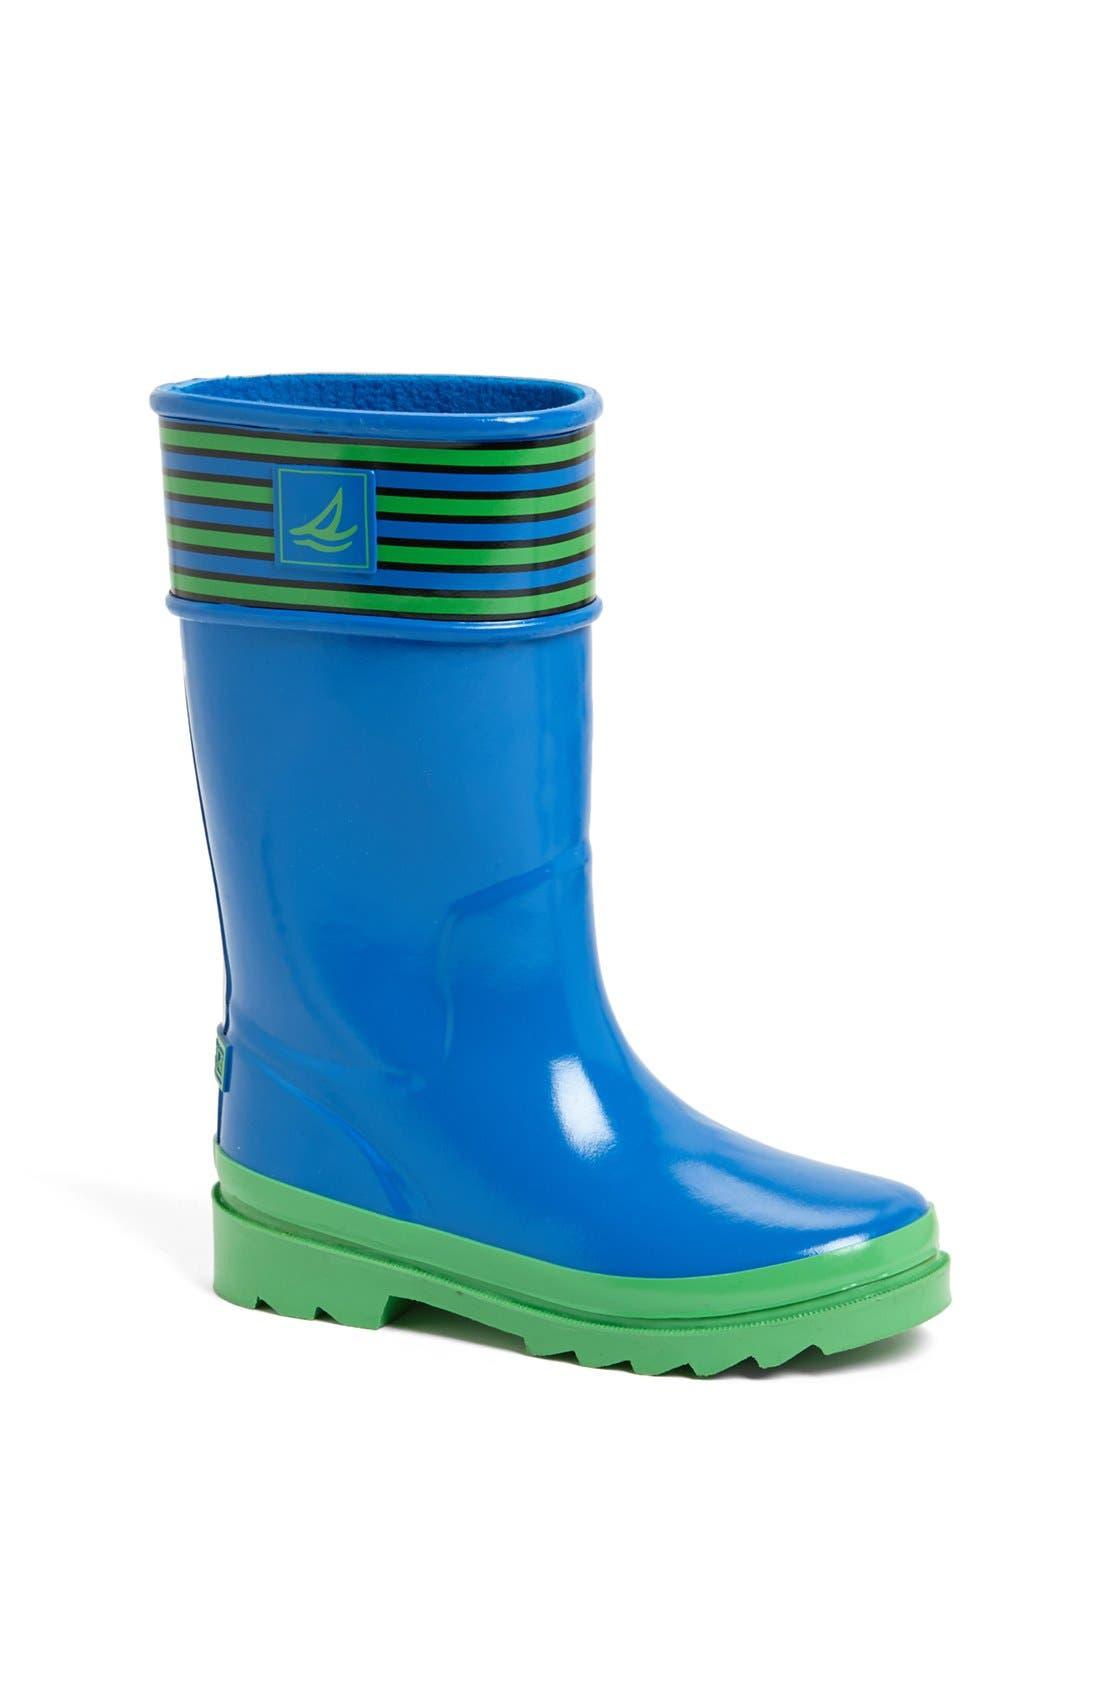 Main Image - Sperry Kids 'Pelican' Rain Boot (Walker, Toddler, Little Kid & Big Kid)